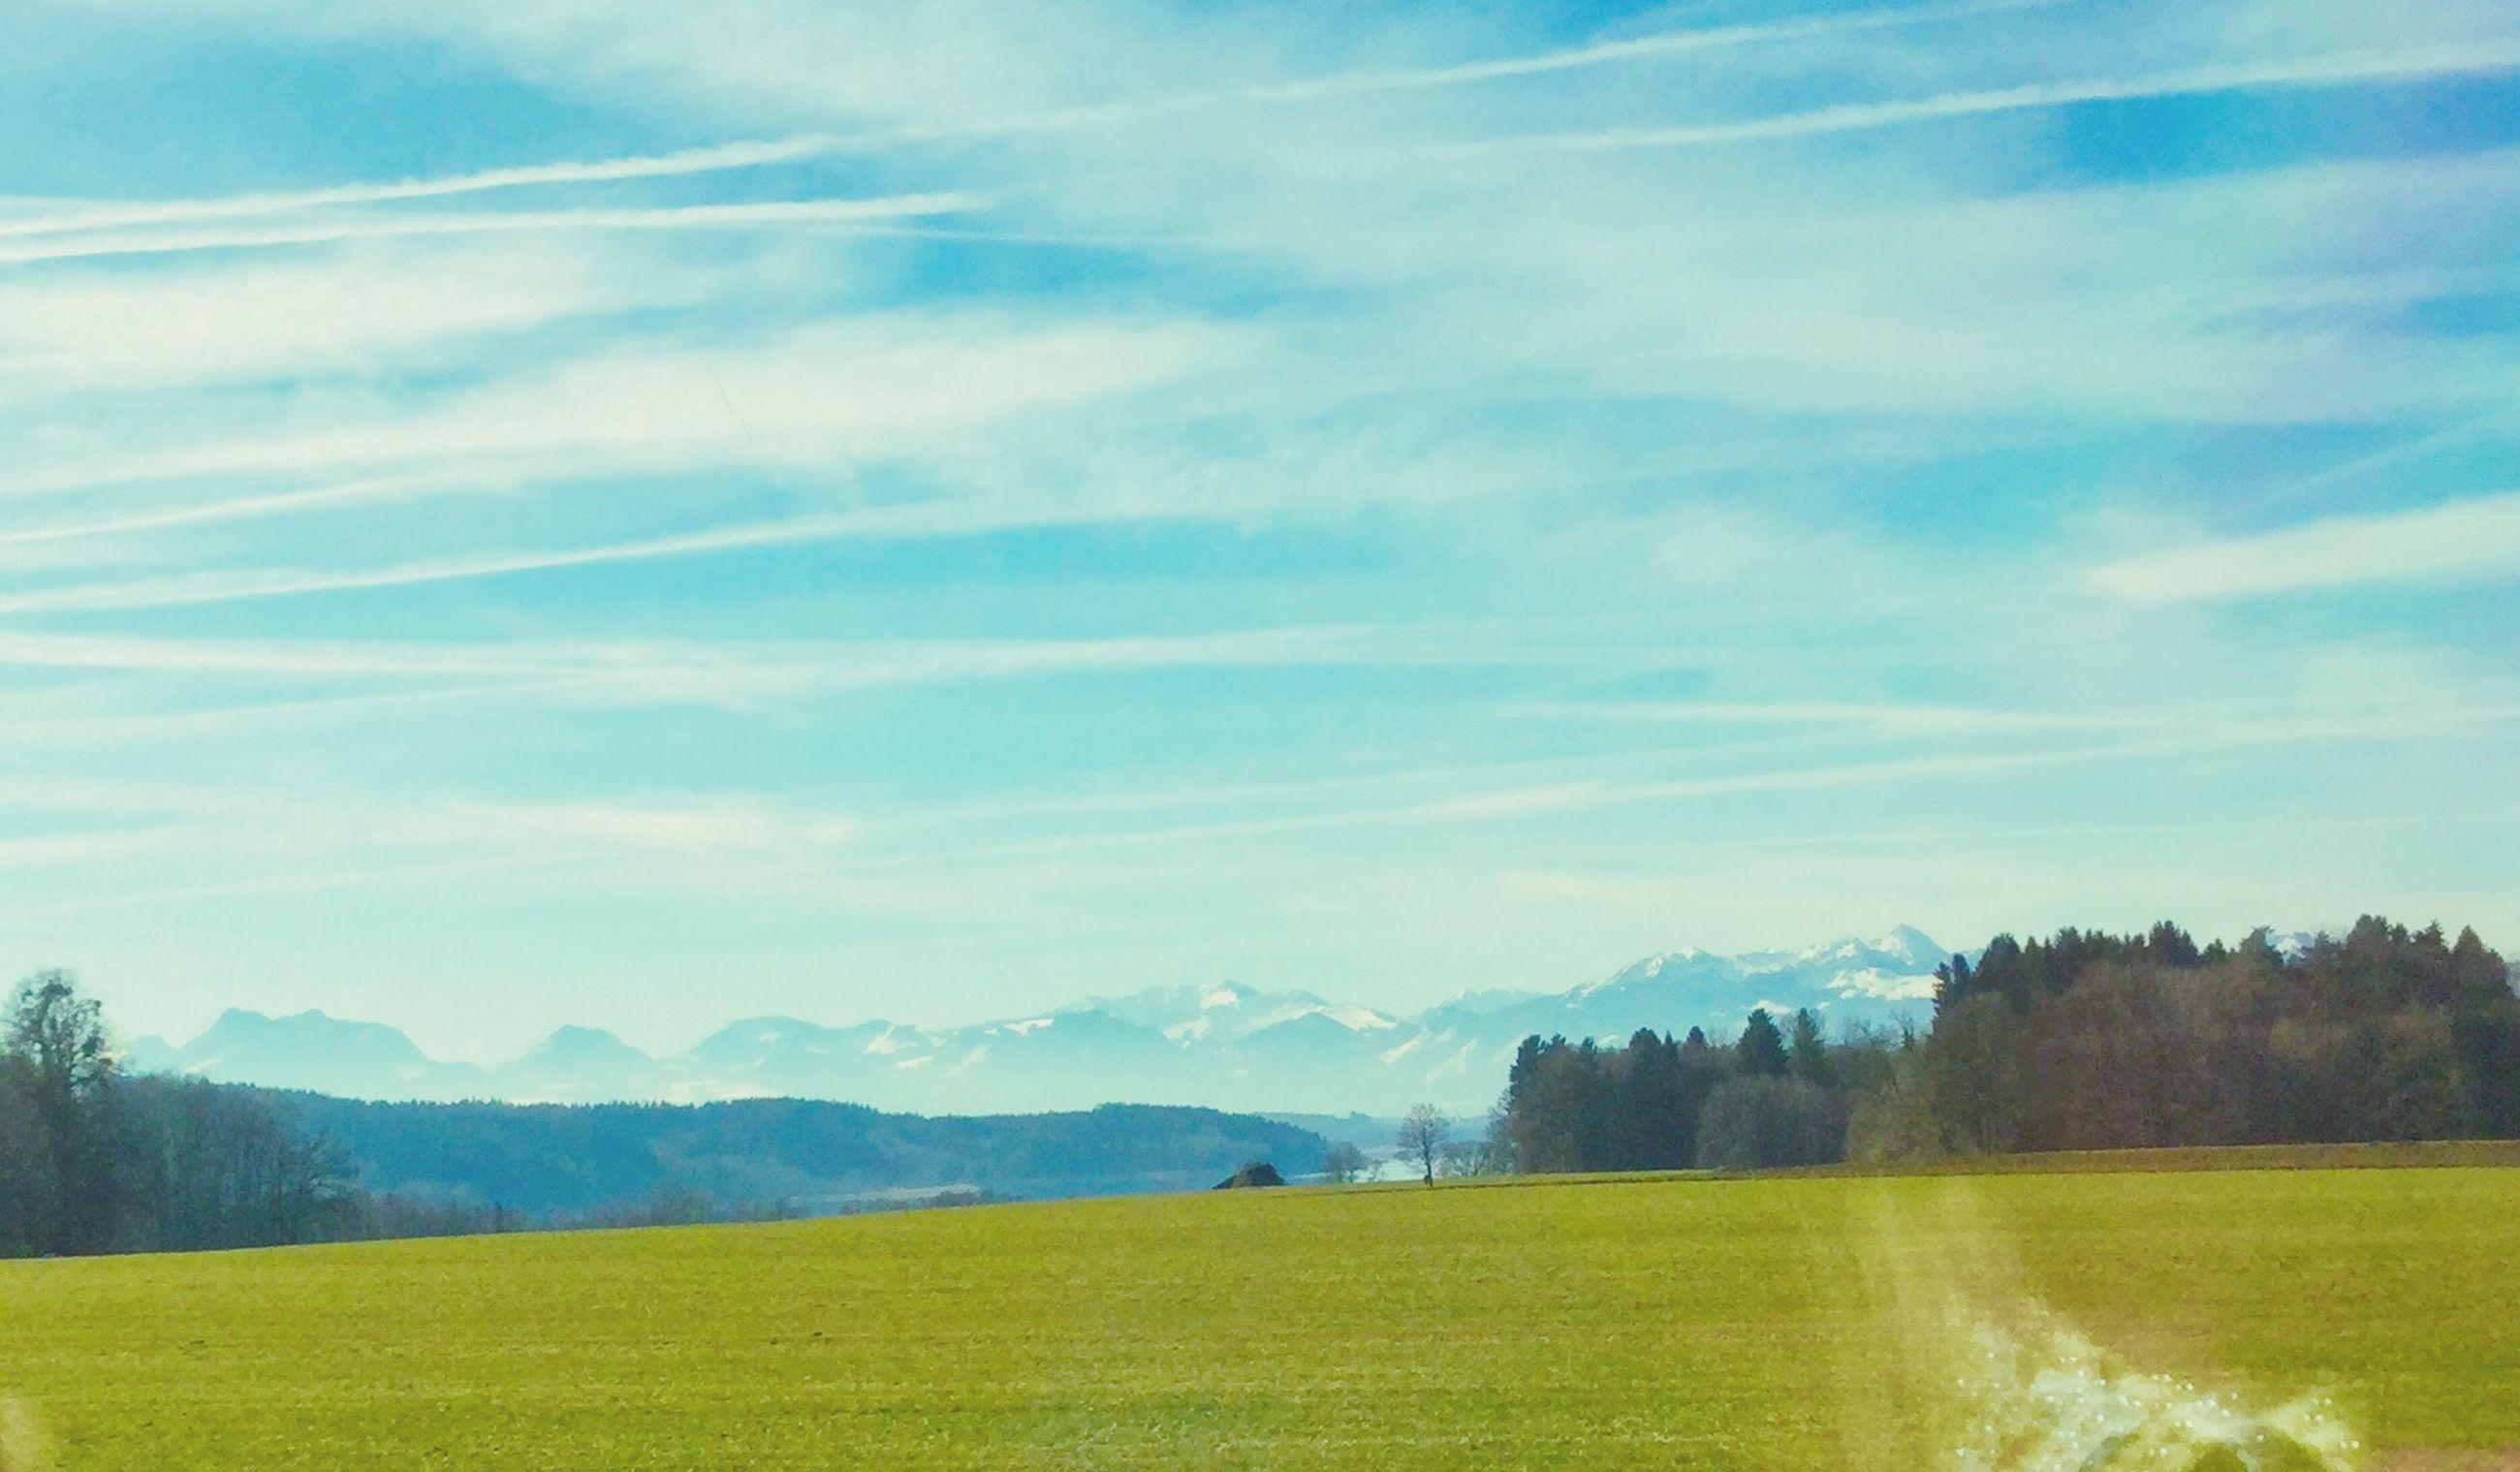 tranquil scene, tranquility, landscape, scenics, beauty in nature, mountain, sky, nature, field, idyllic, mountain range, tree, non-urban scene, green color, grass, cloud - sky, cloud, rural scene, remote, no people